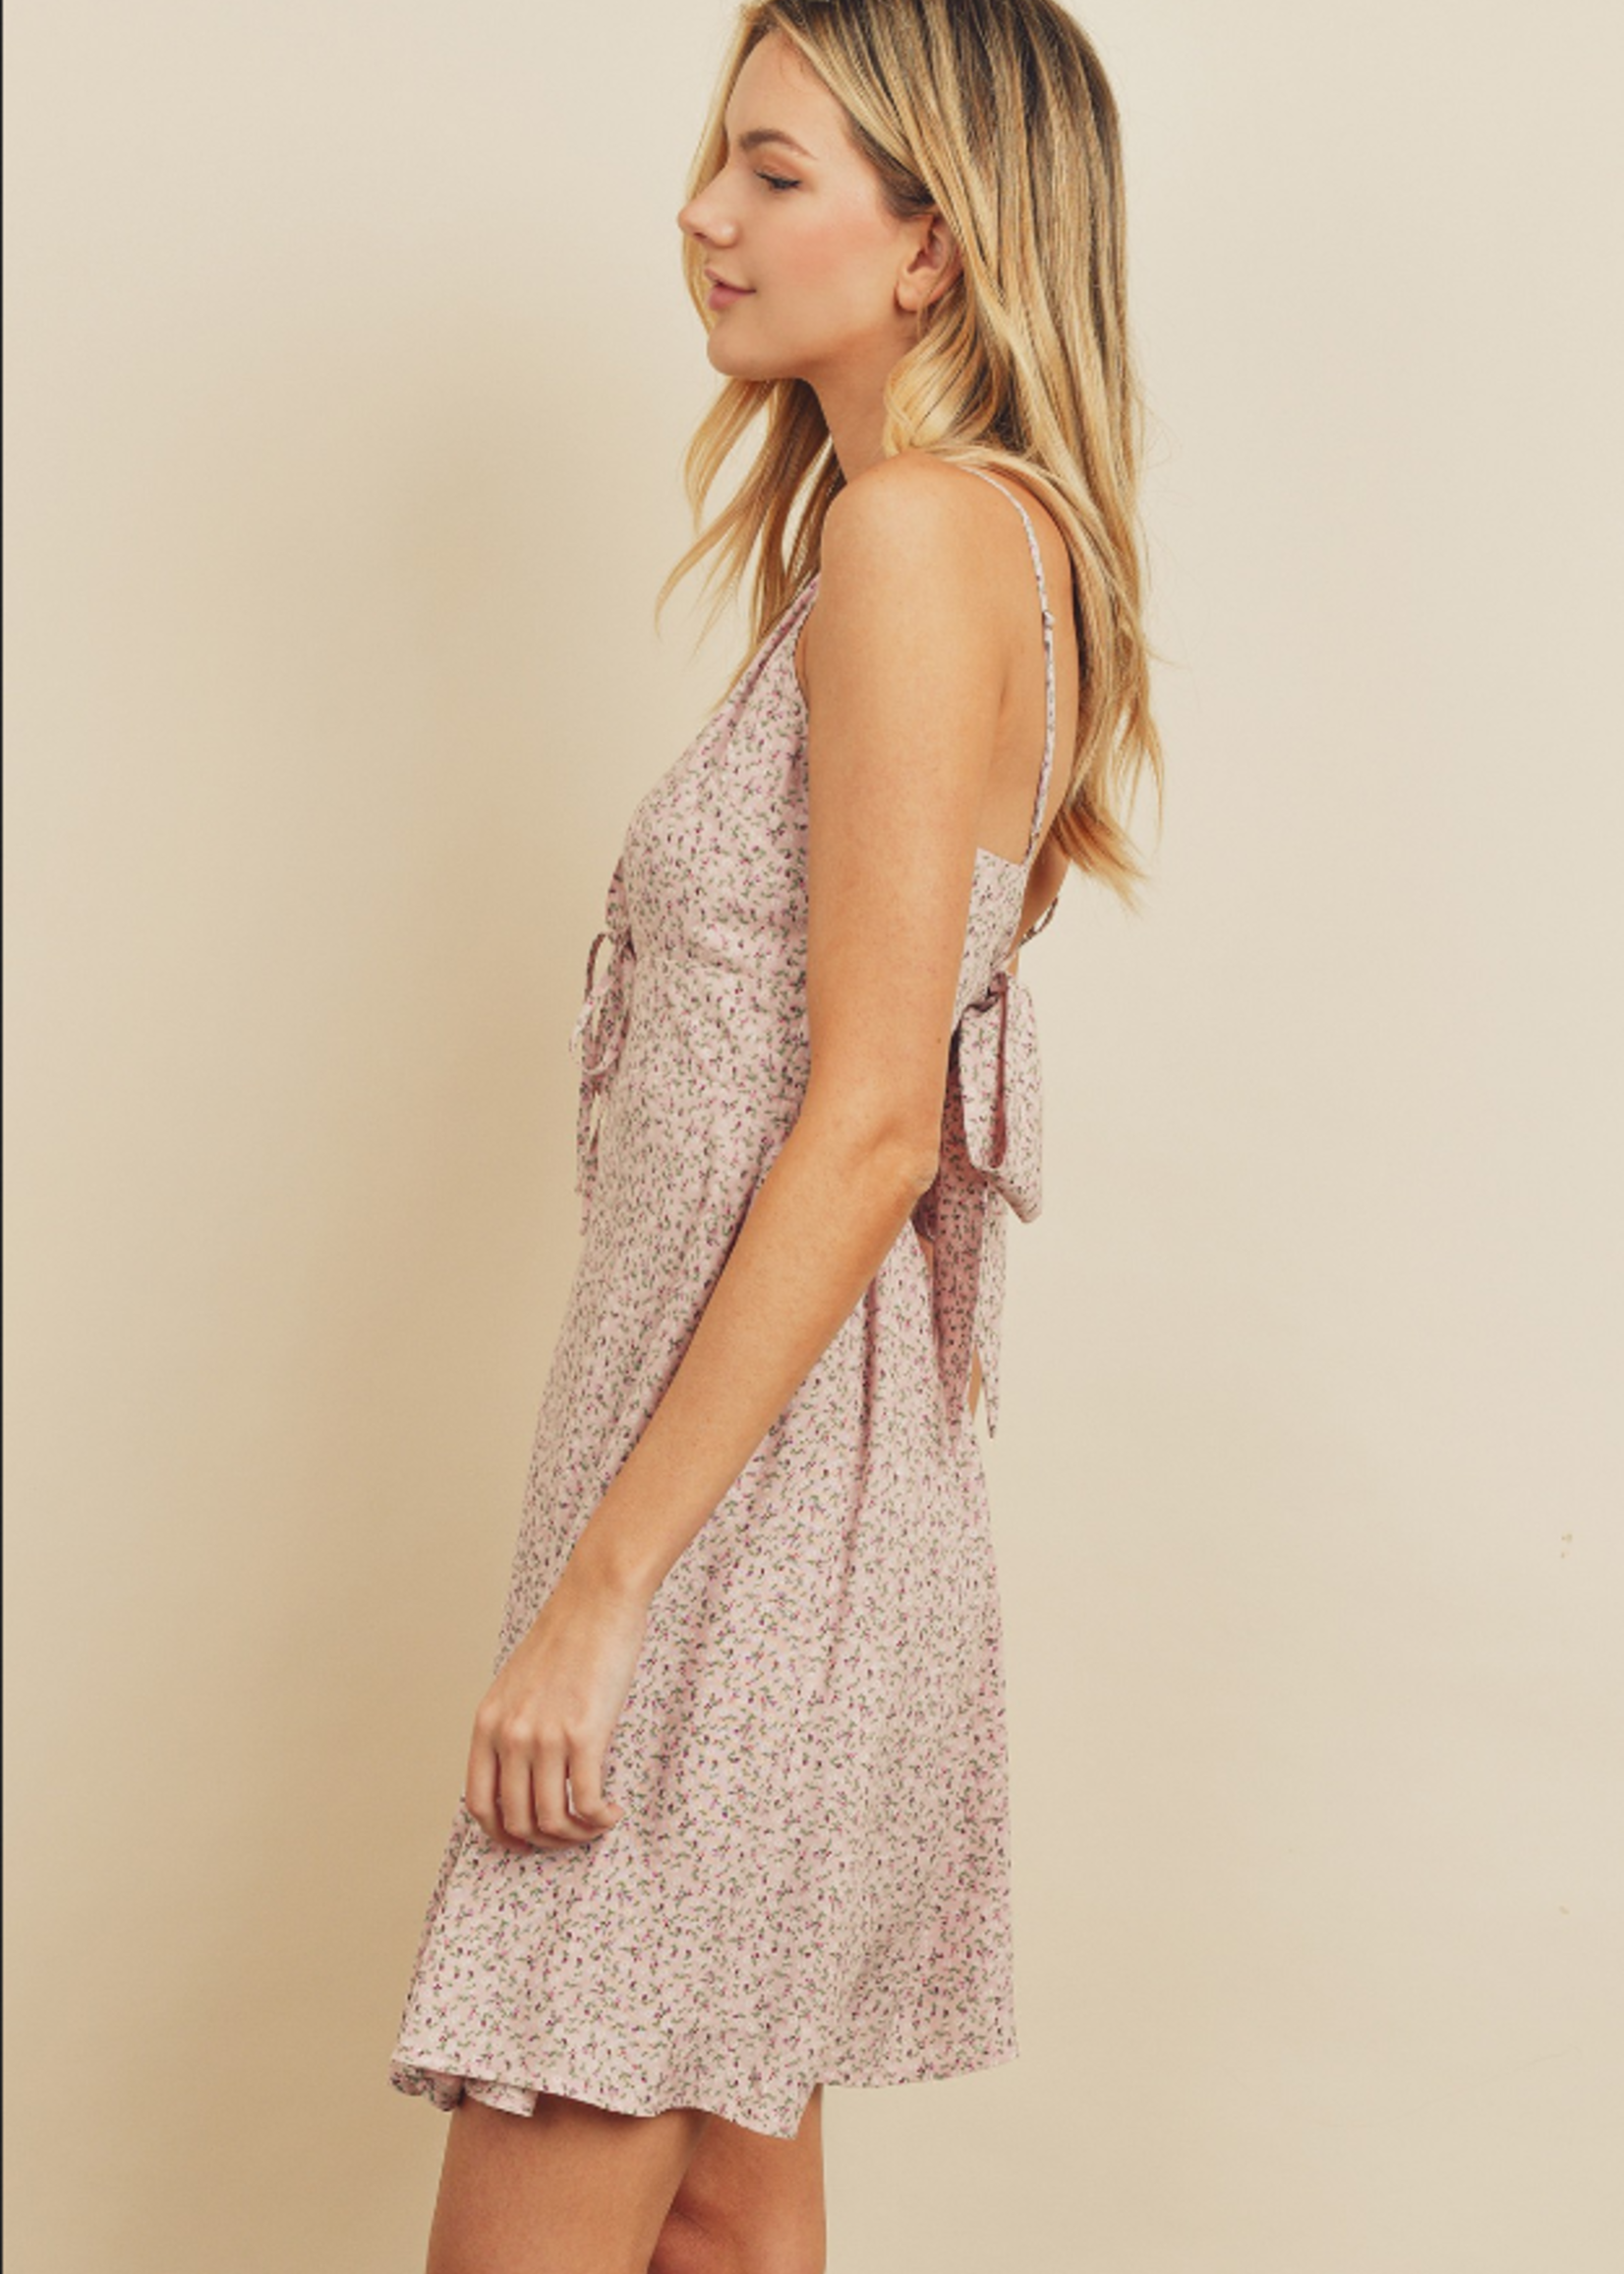 Ditsy Floral Dress w/tie - Pink Multi